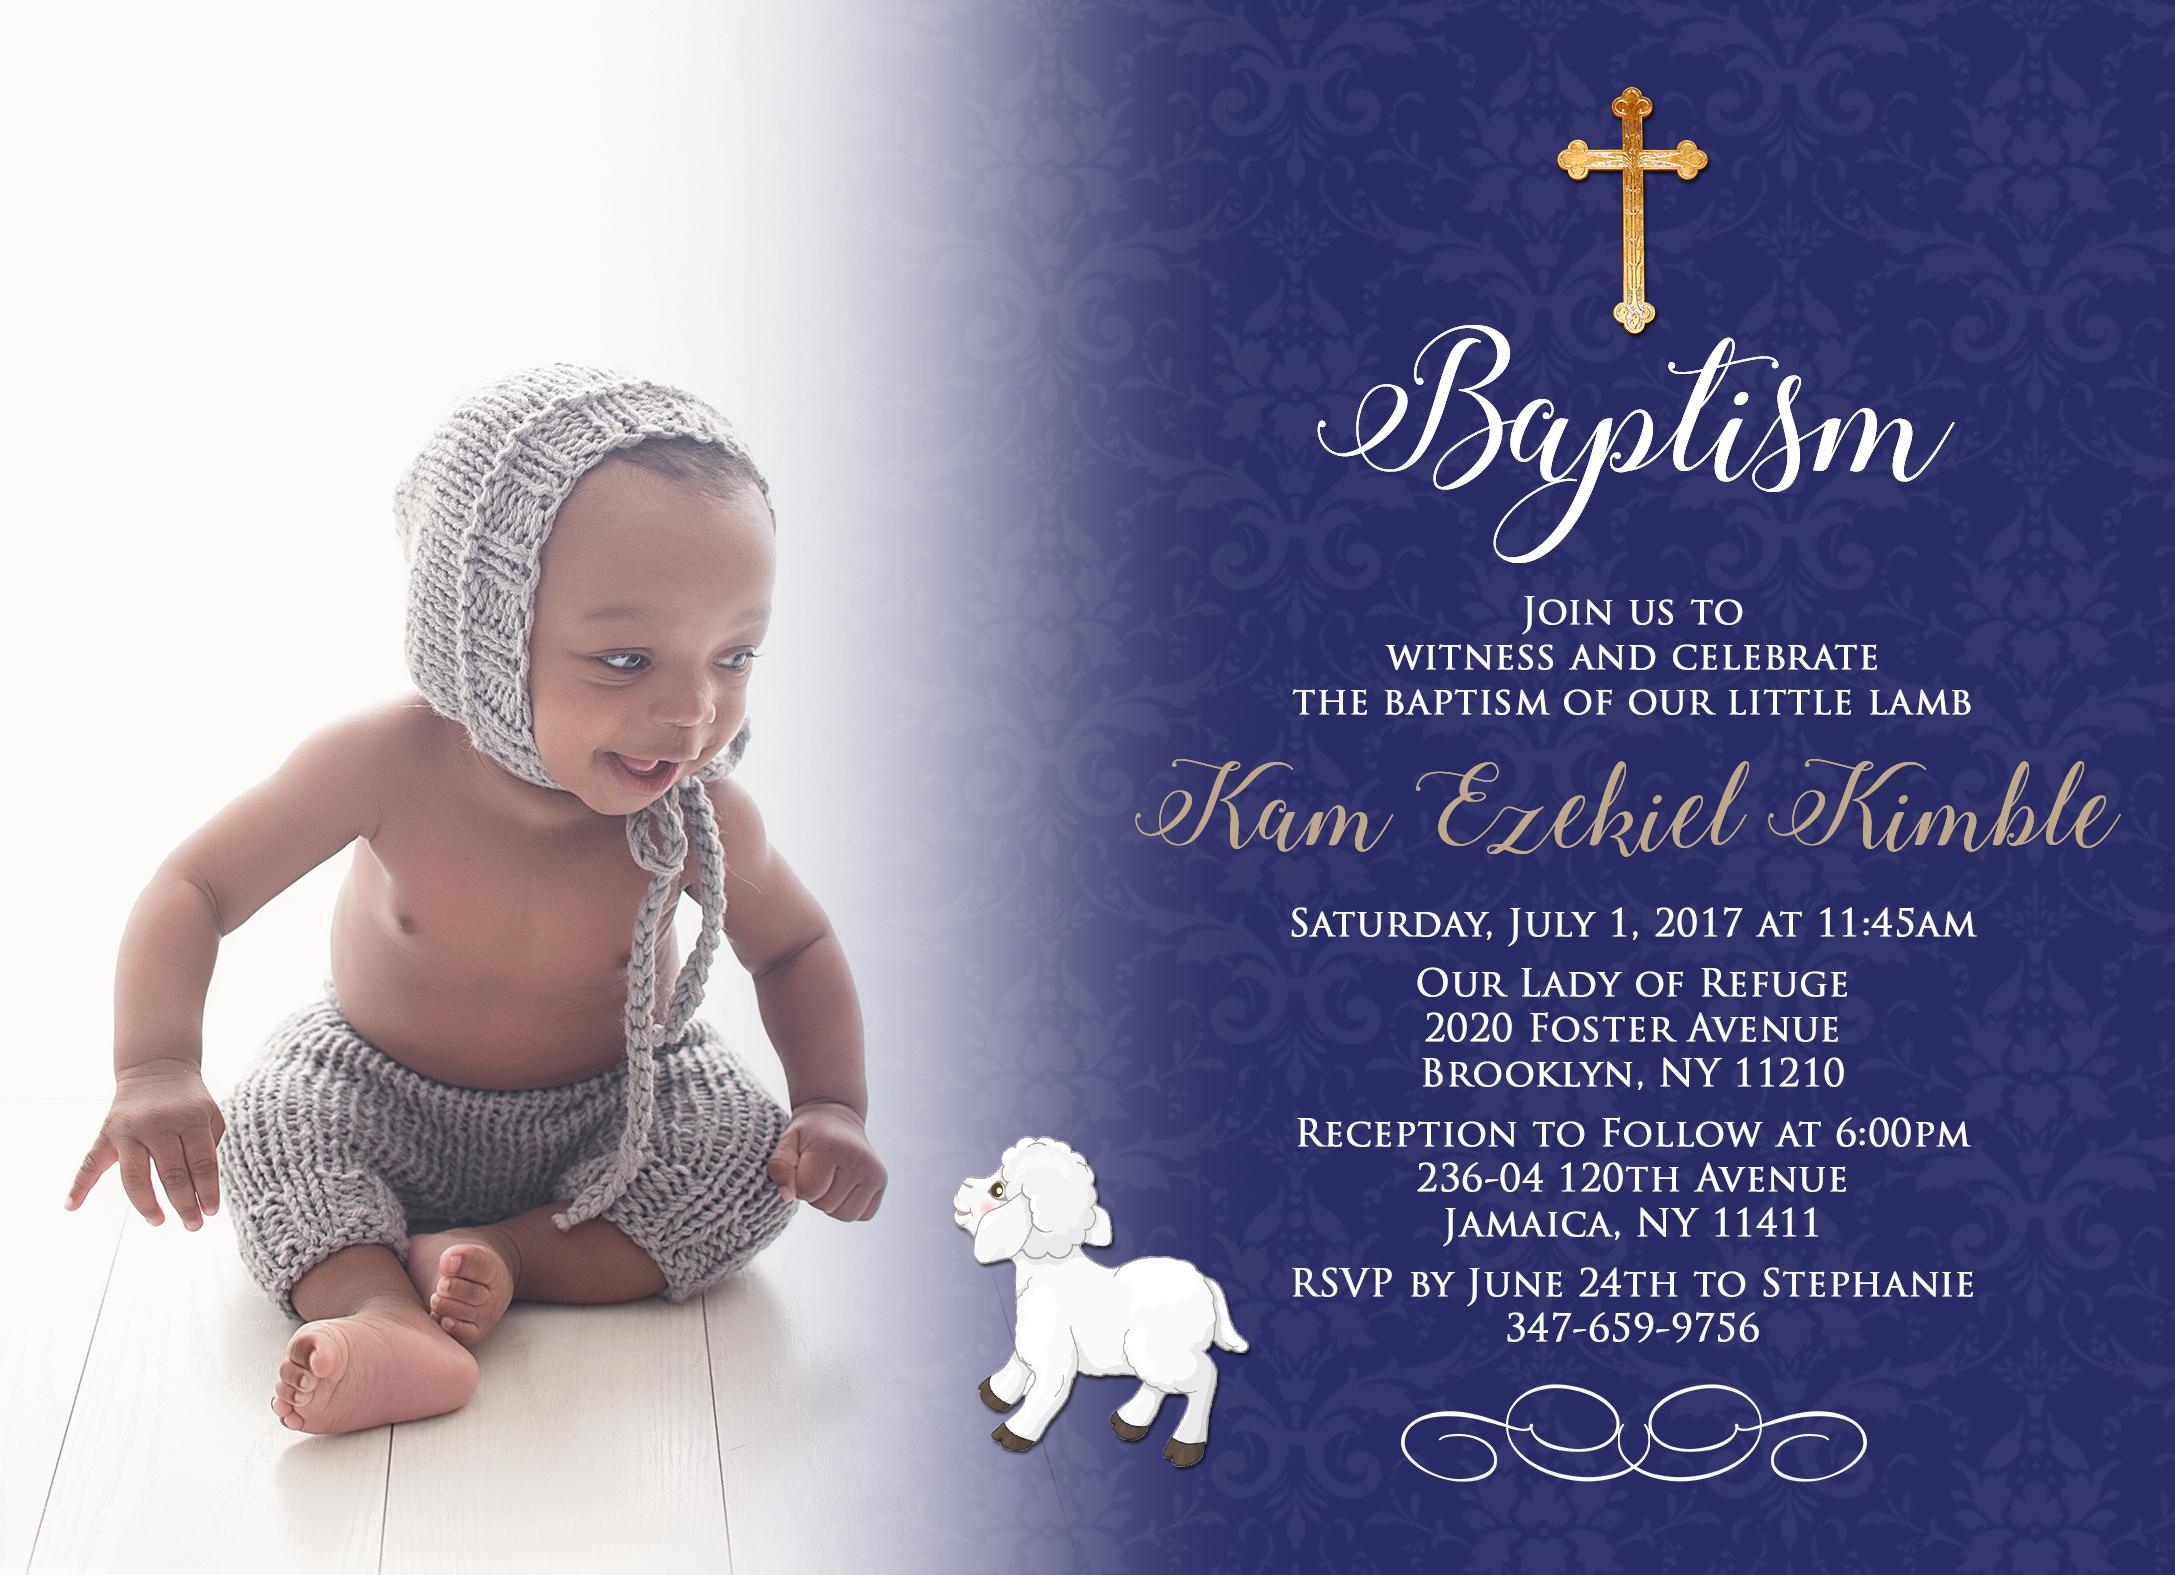 Kam's Baptism